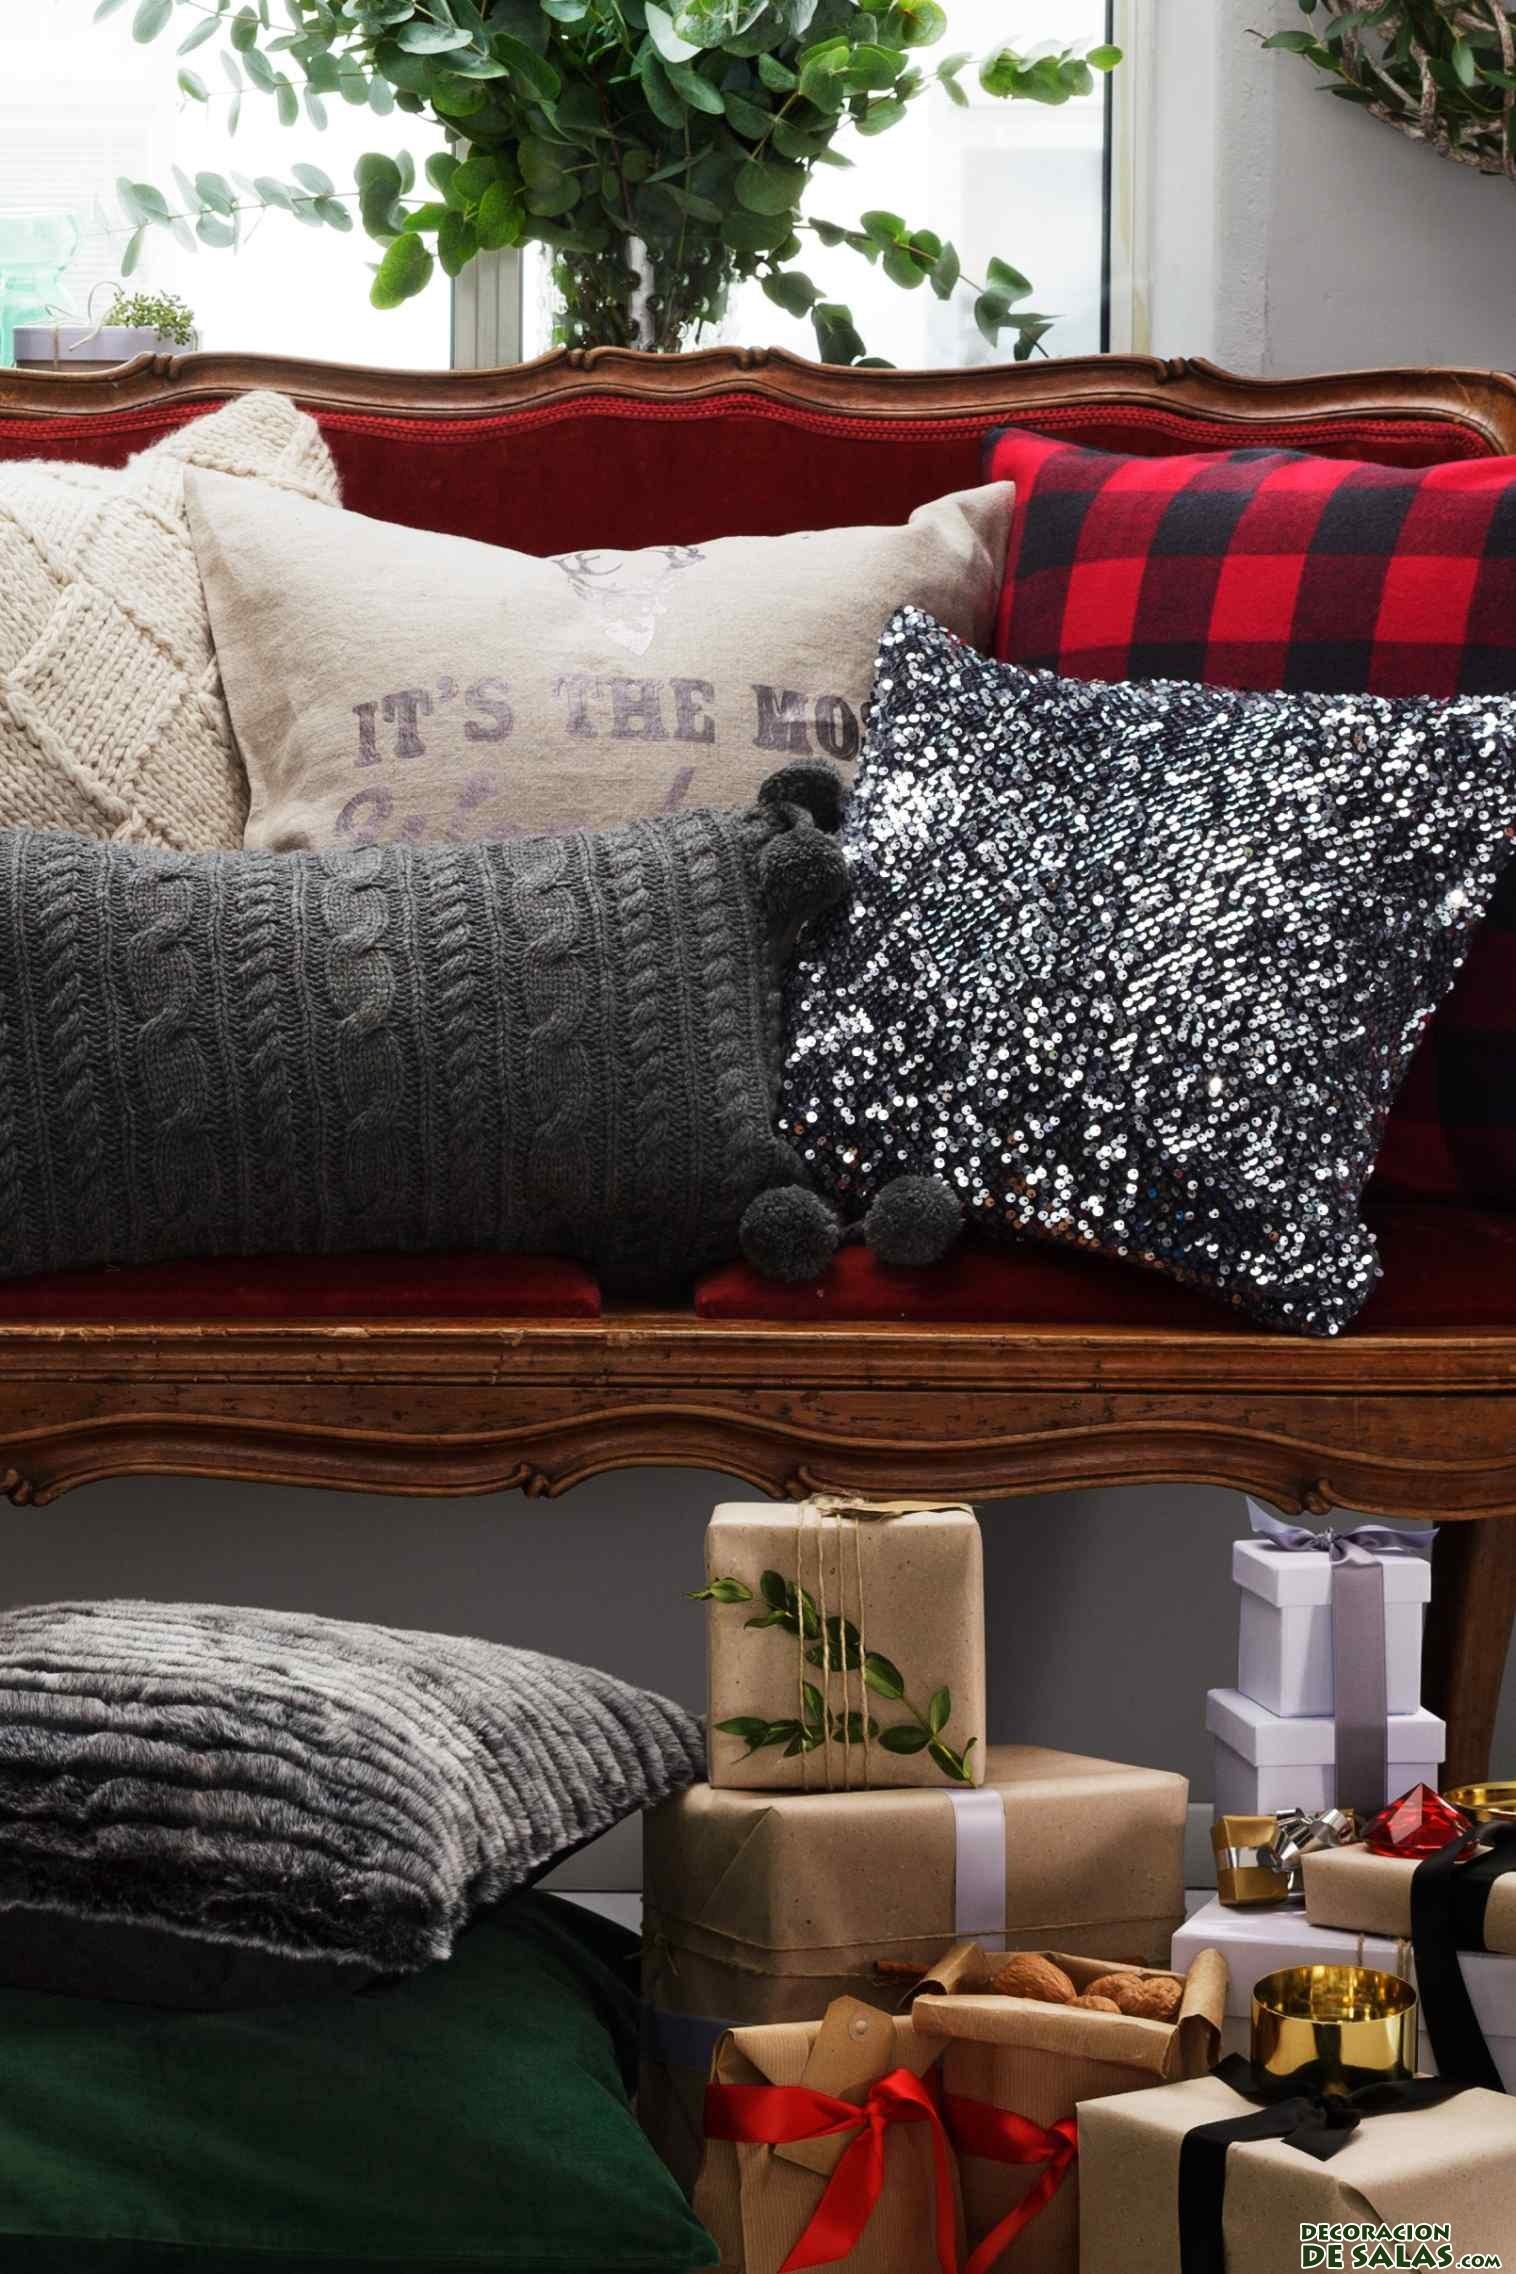 Decora tu casa con detalles de h m for Detalles decoracion casa